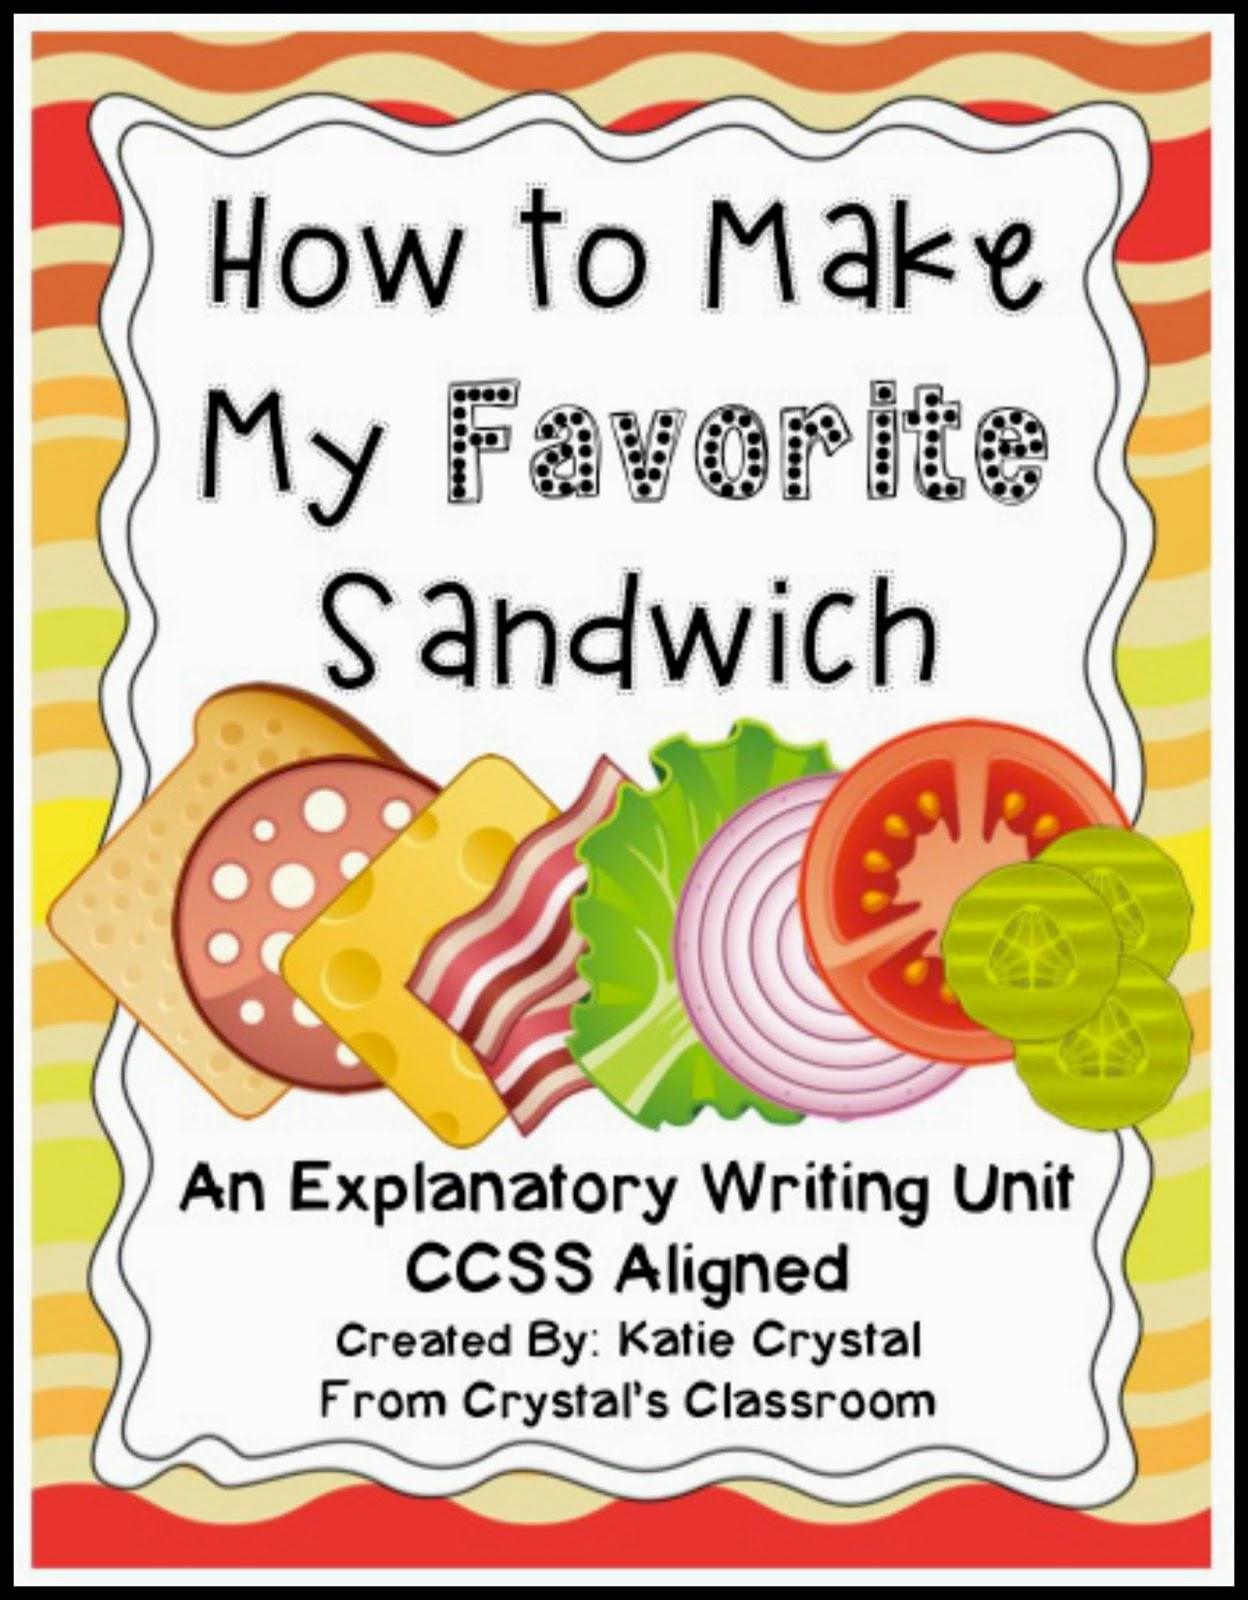 Crystal\'s Classroom: A Peanut Butter, Honey, and Banana Sandwich